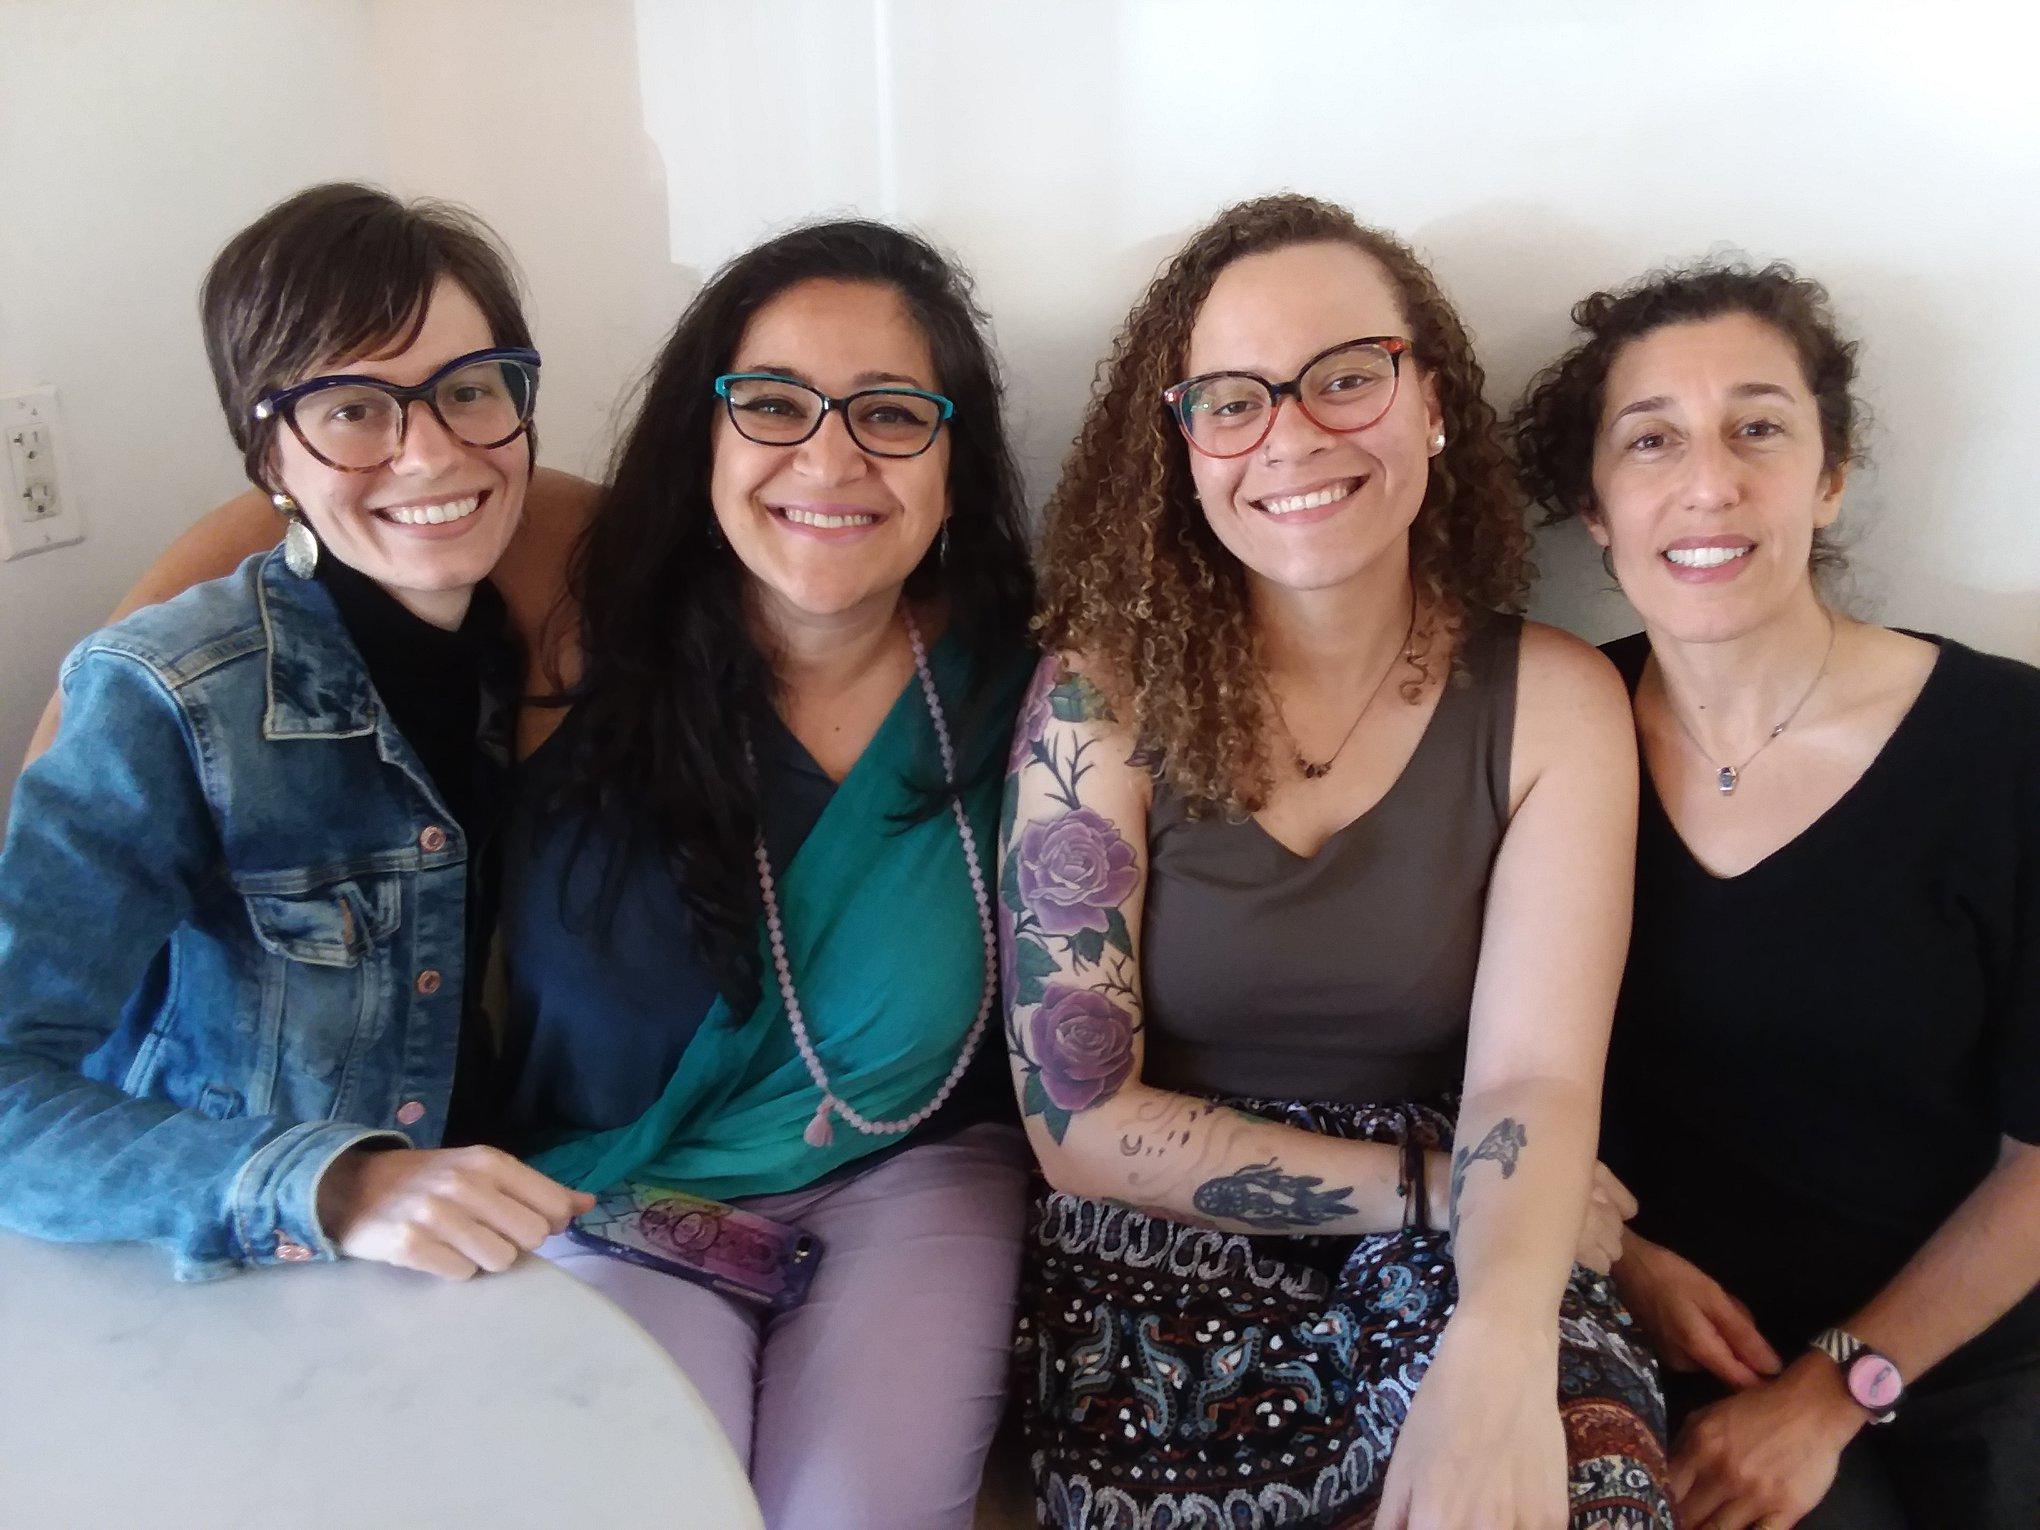 From left: Luba Douzeich, Irina Normatov, Antonia Venesse Guy, Andria Alefhi - show #4 June 22, 2019